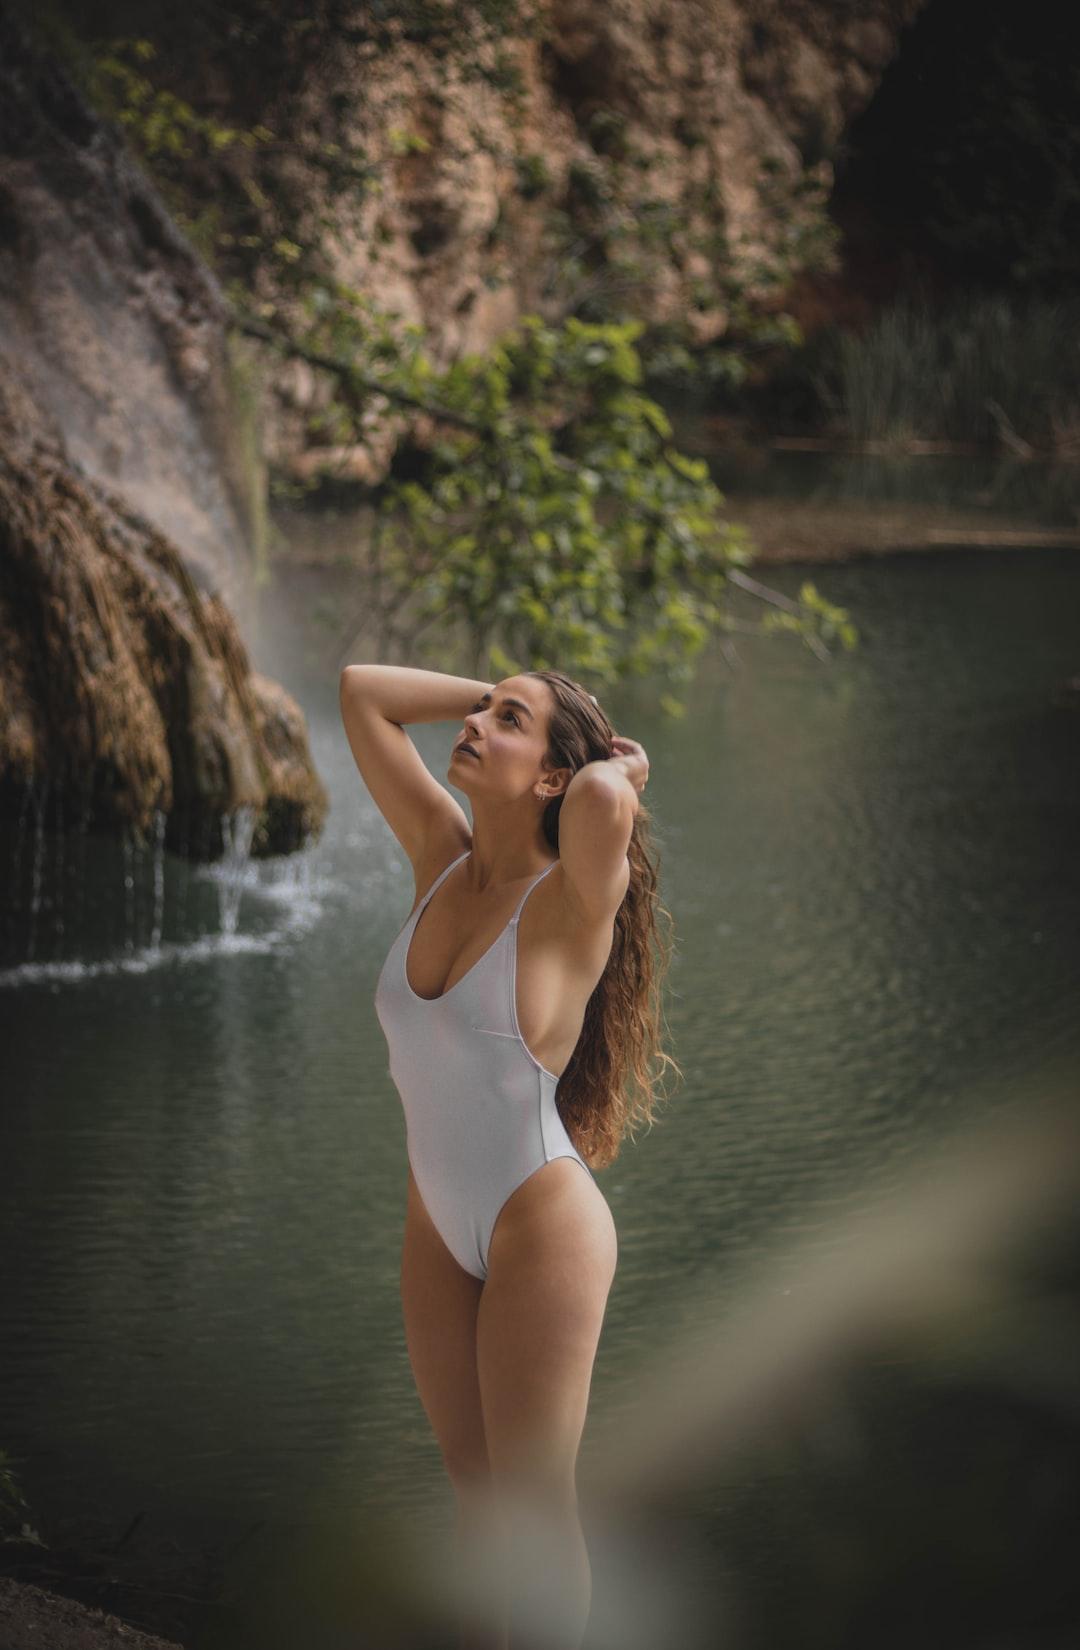 Desnudos femeninos libres